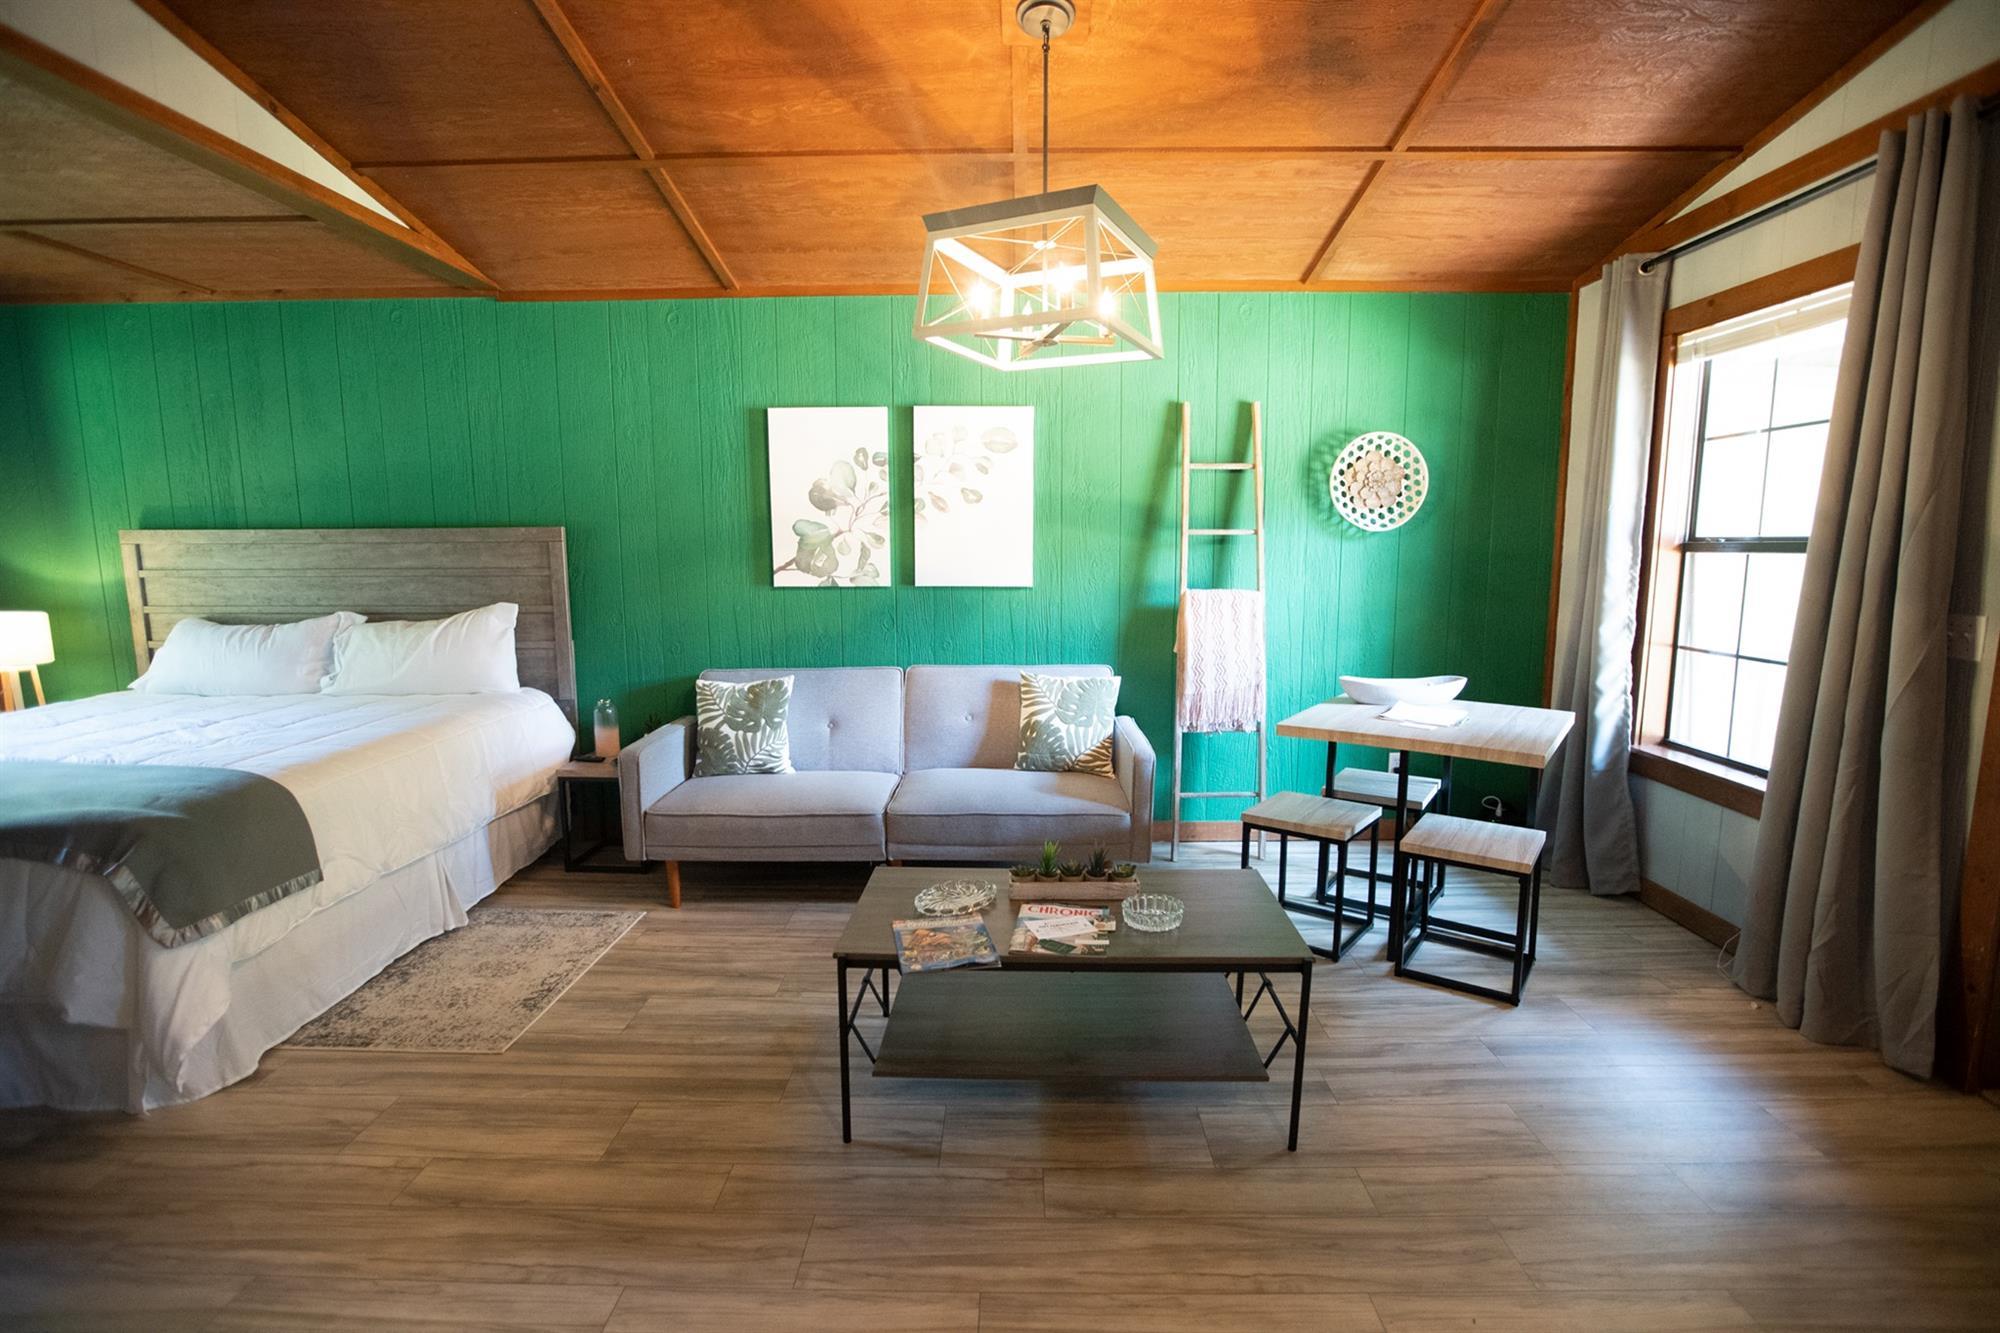 Image for 07) Kush Cabin Green Dream